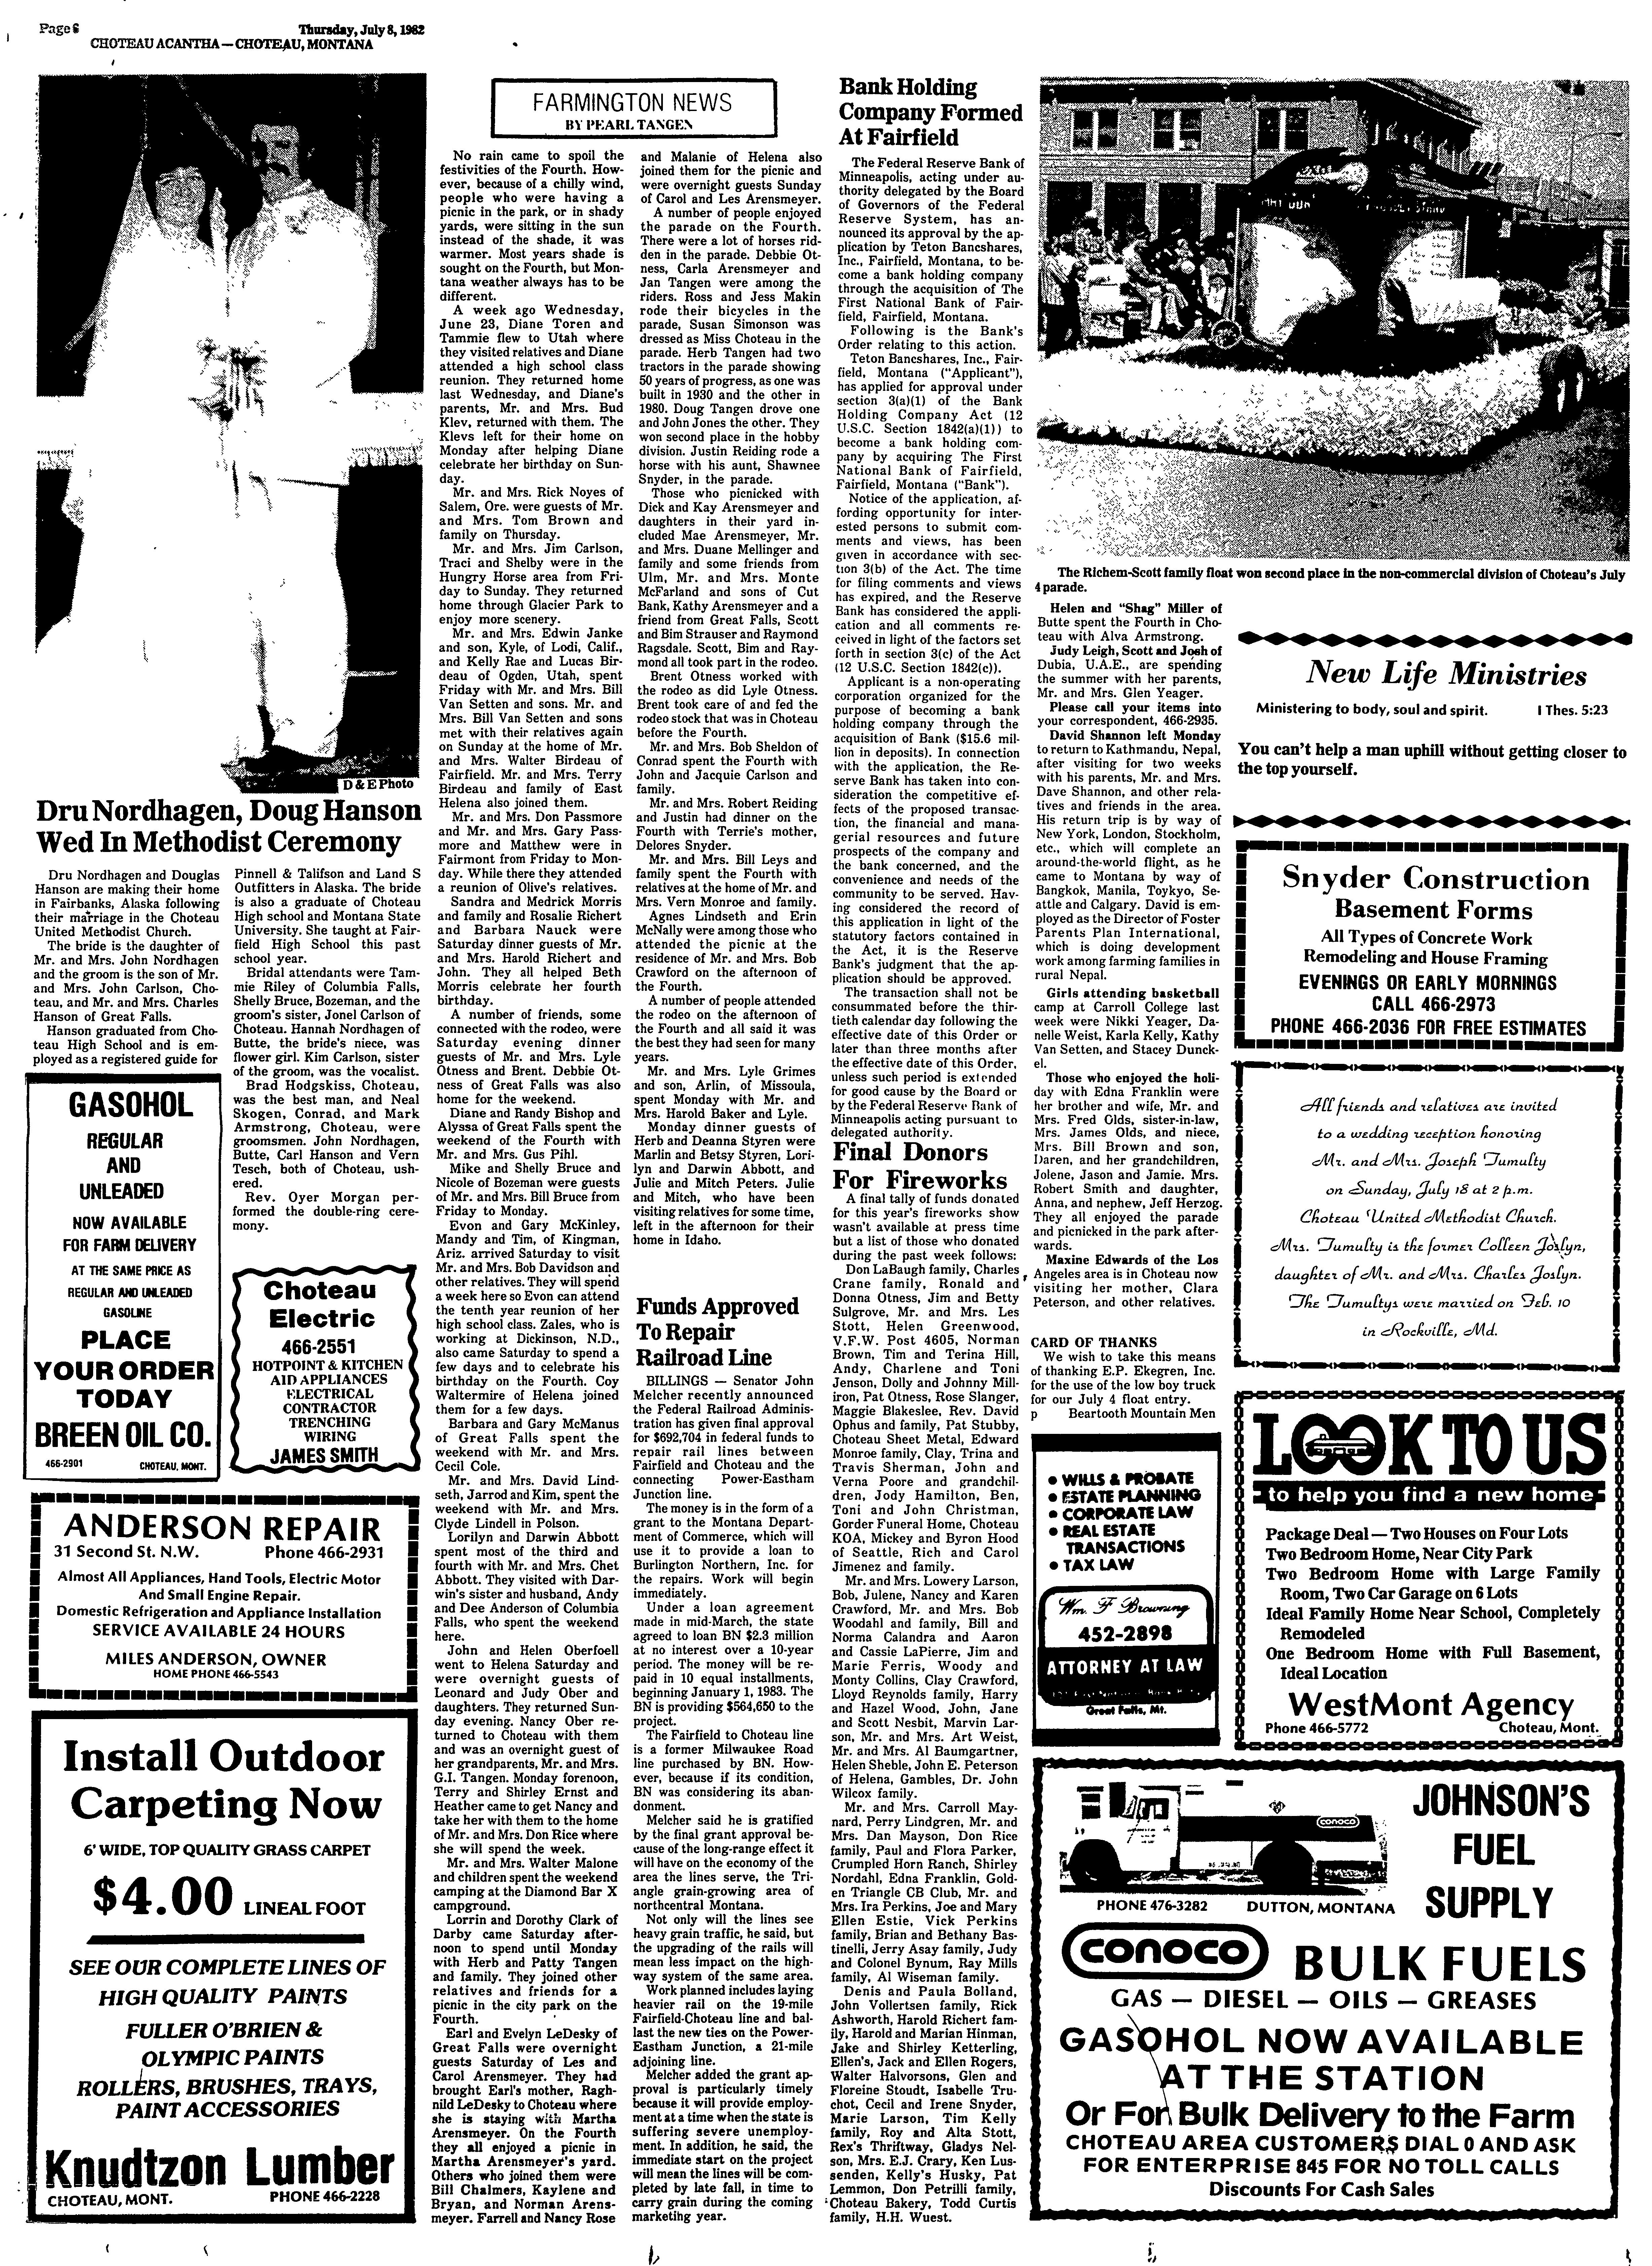 The Choteau Acantha (Choteau, Mont.) 1904-current, July 08, 1982 ...